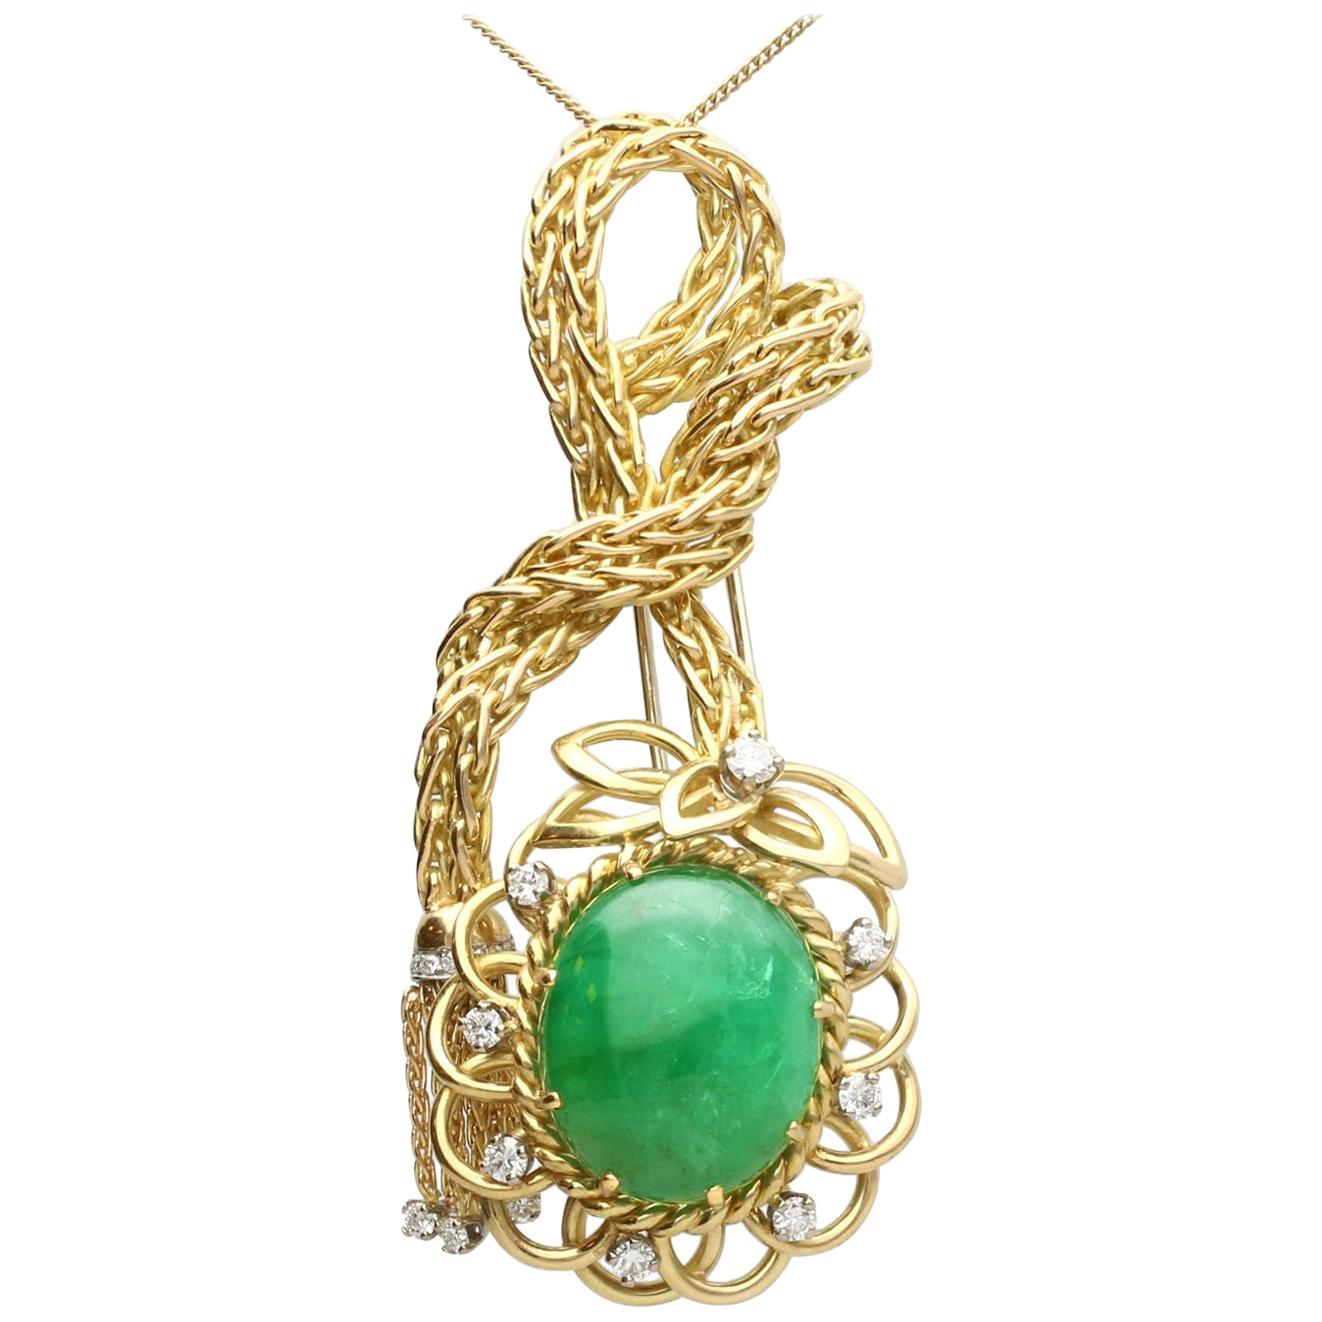 26.16 Carat Emerald and Diamond Yellow Gold Brooch Pendant